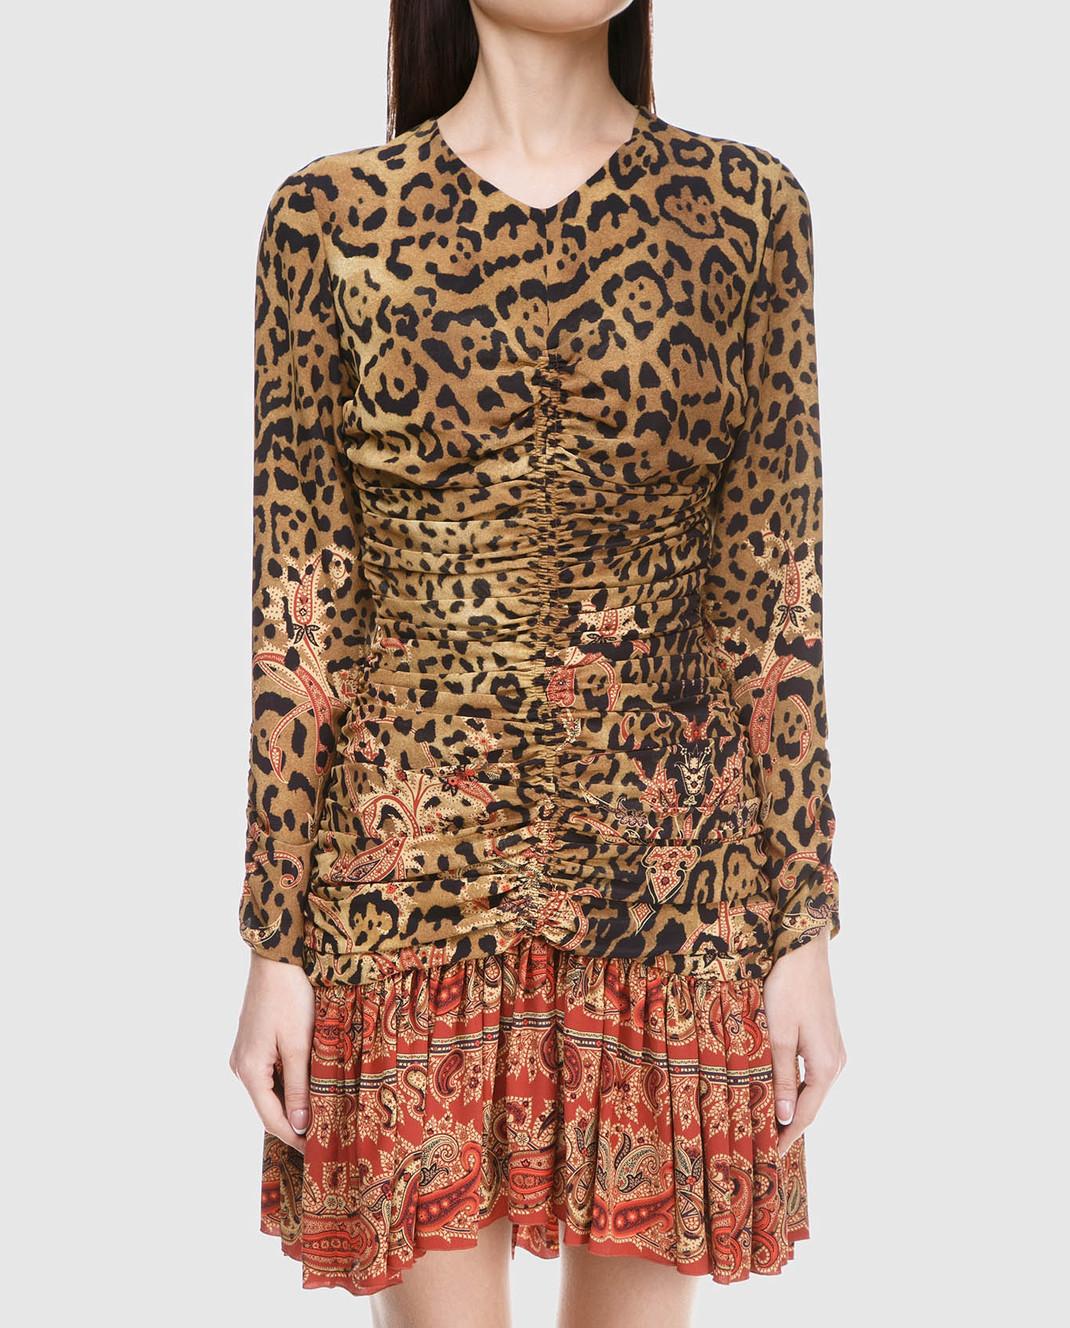 Etro Бежевое платье из шелка D152335384 изображение 3